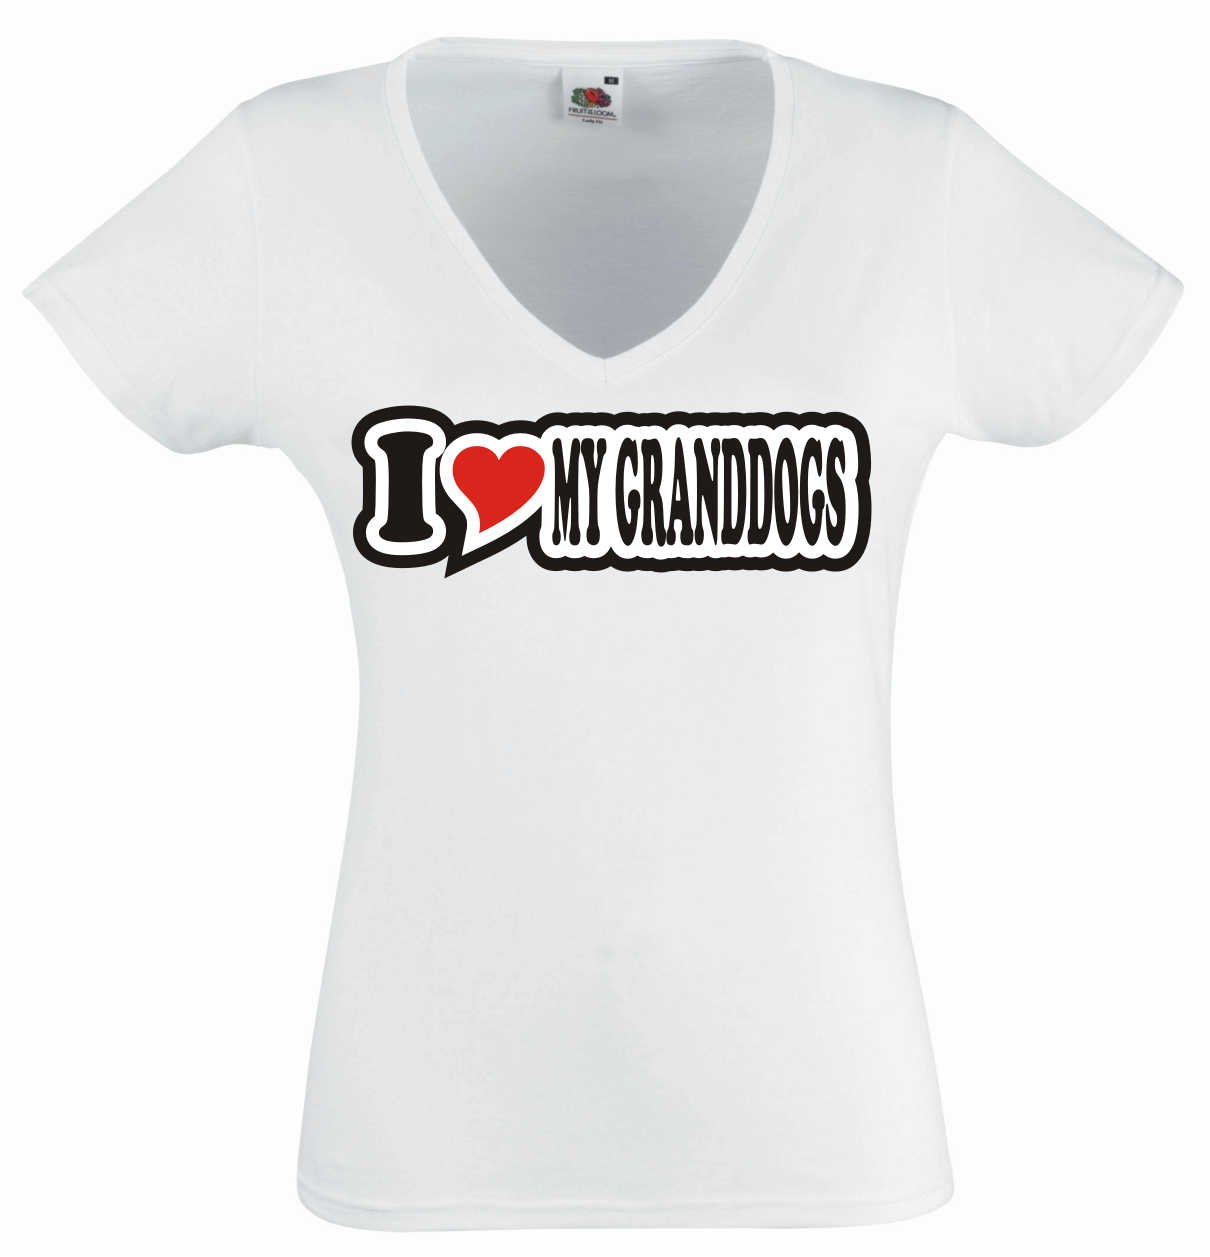 I Love Heart T-Shirt Women V Neck I LOVE MY GRANDDOGS Black Dragon